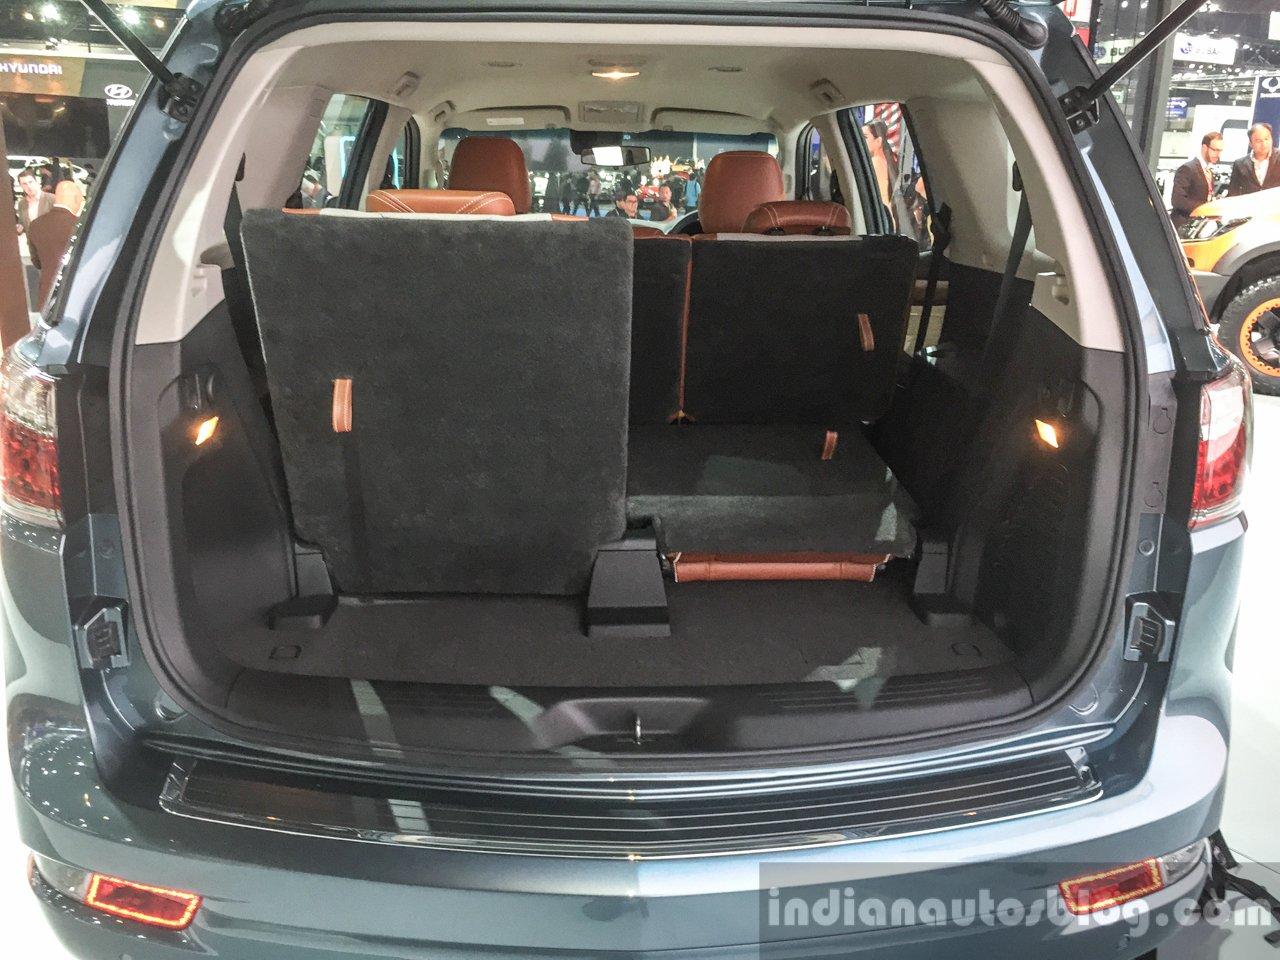 2016 Chevrolet Trailblazer Premier (facelift) boot space at 2016 BIMS